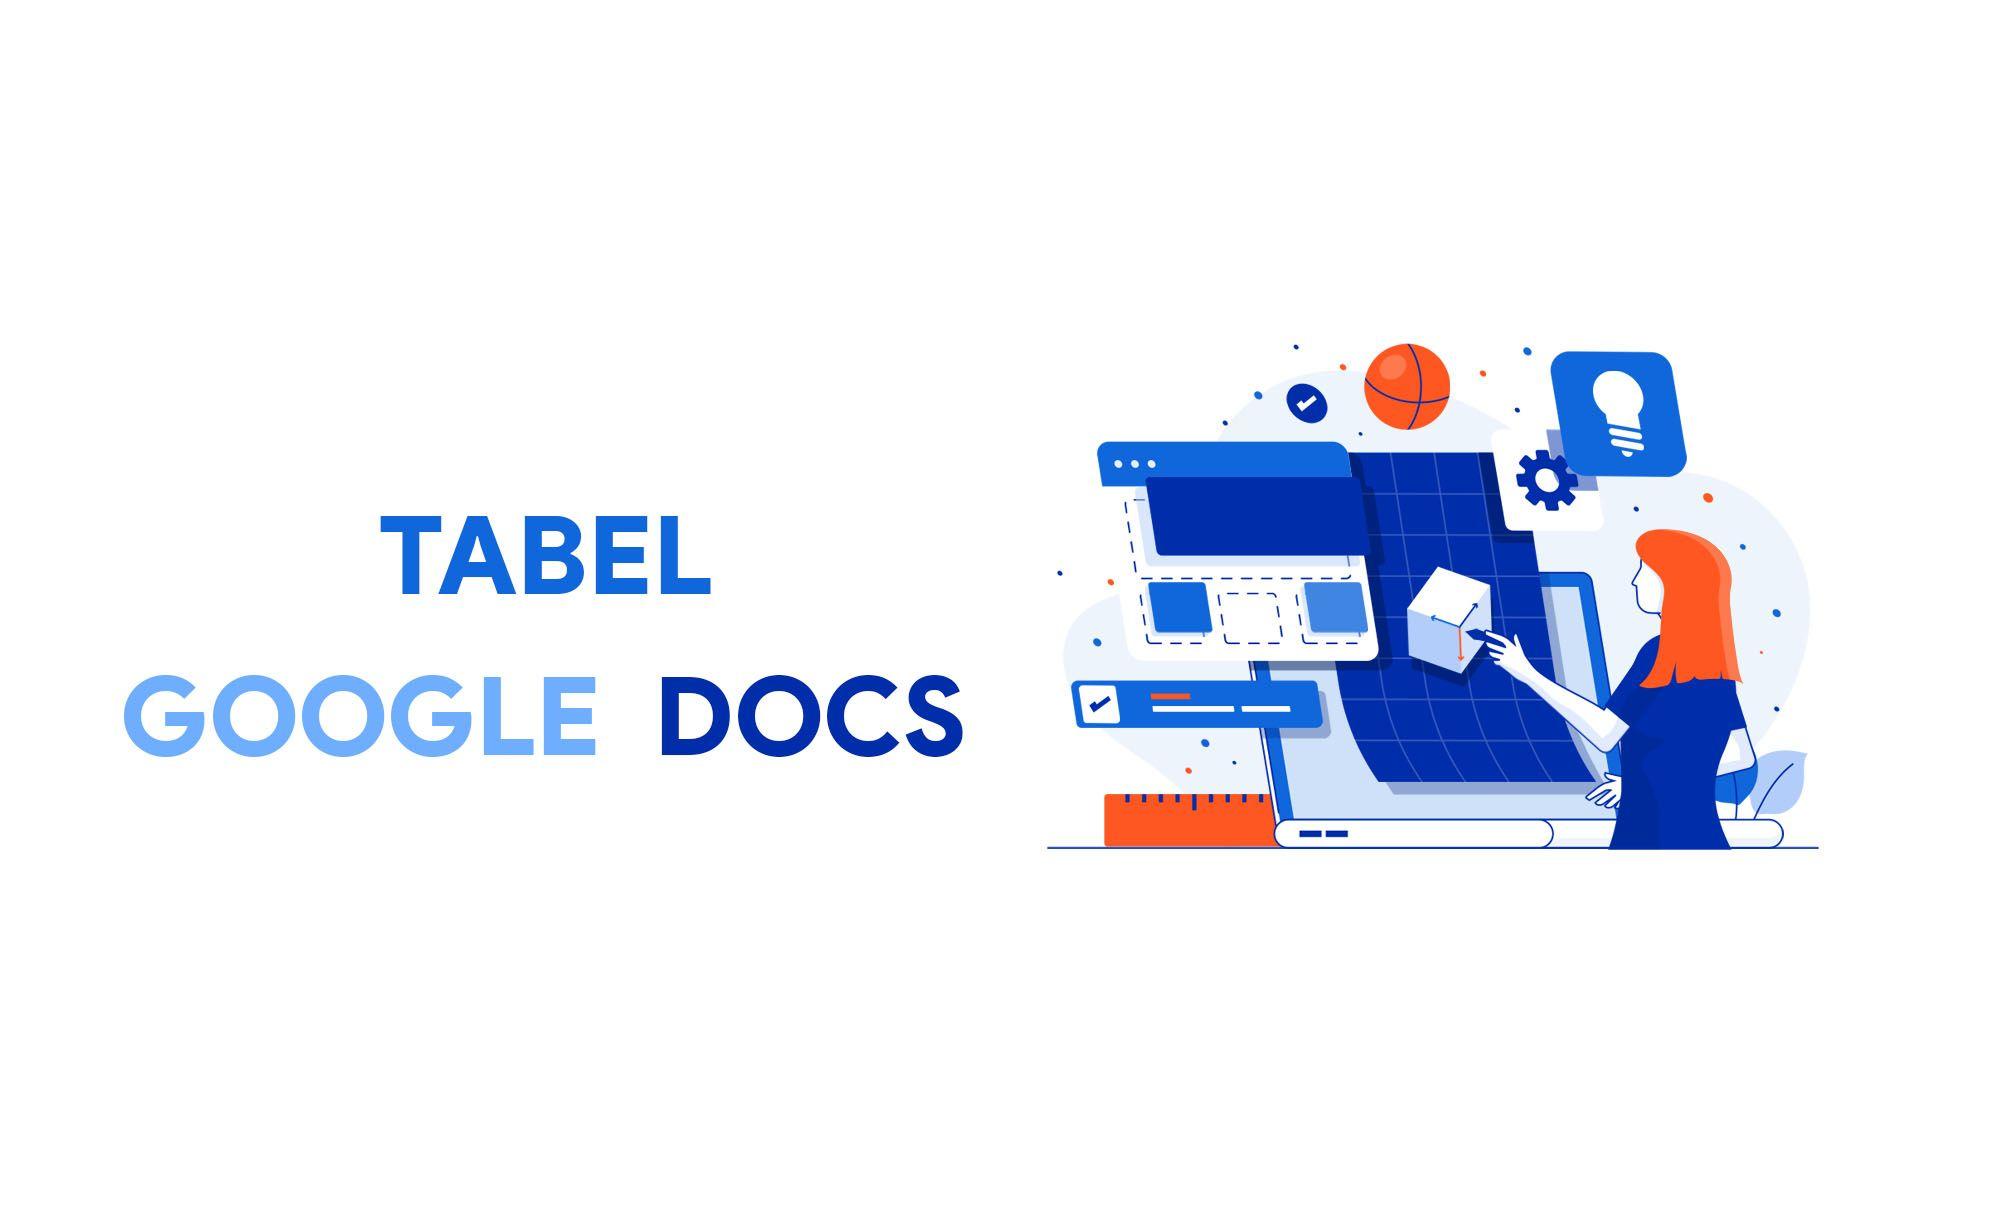 Cara Membuat Tabel Di Google Documents Docs Google